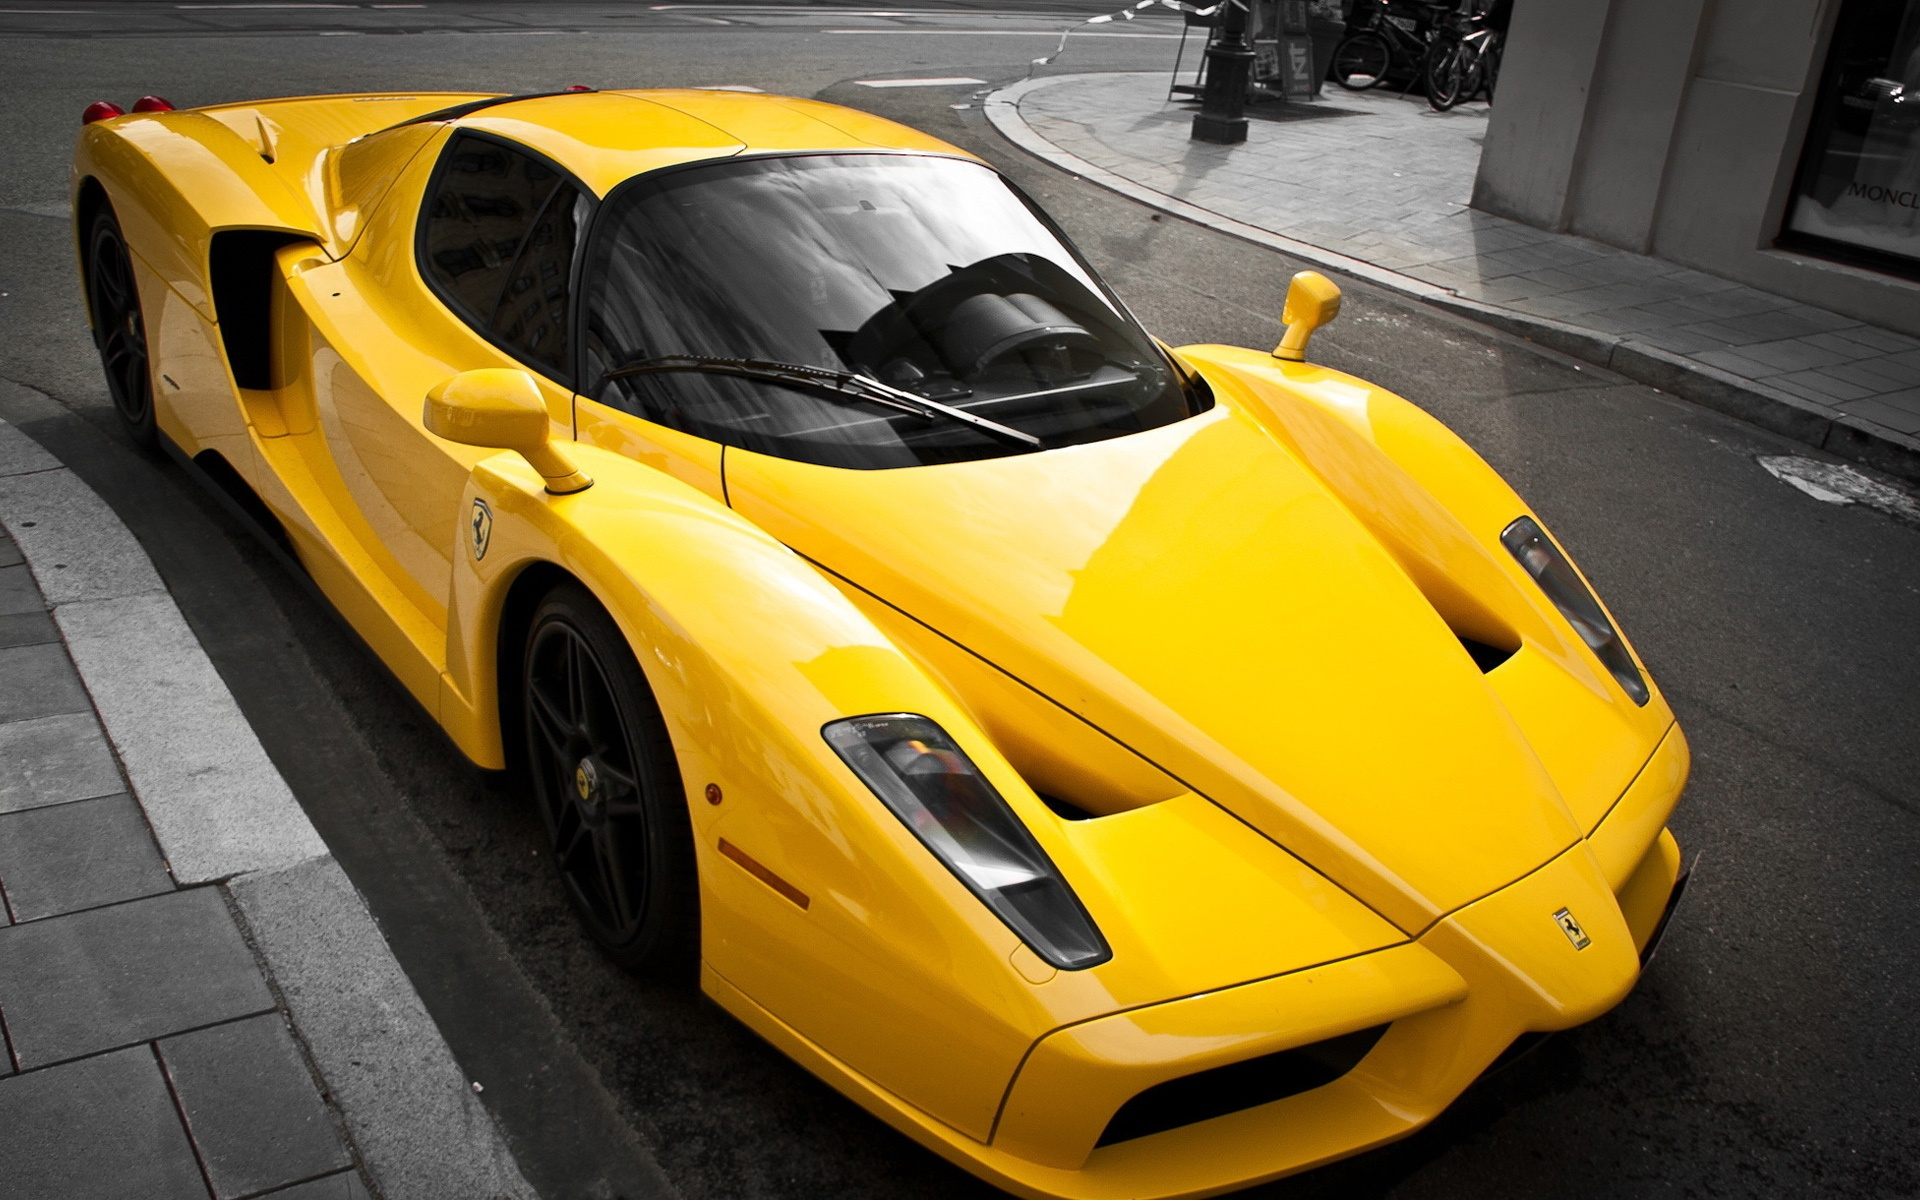 Papeis De Parede Ferrari Enzo Luxo Amarelo Supercarro 1920x1200 Hd Imagem